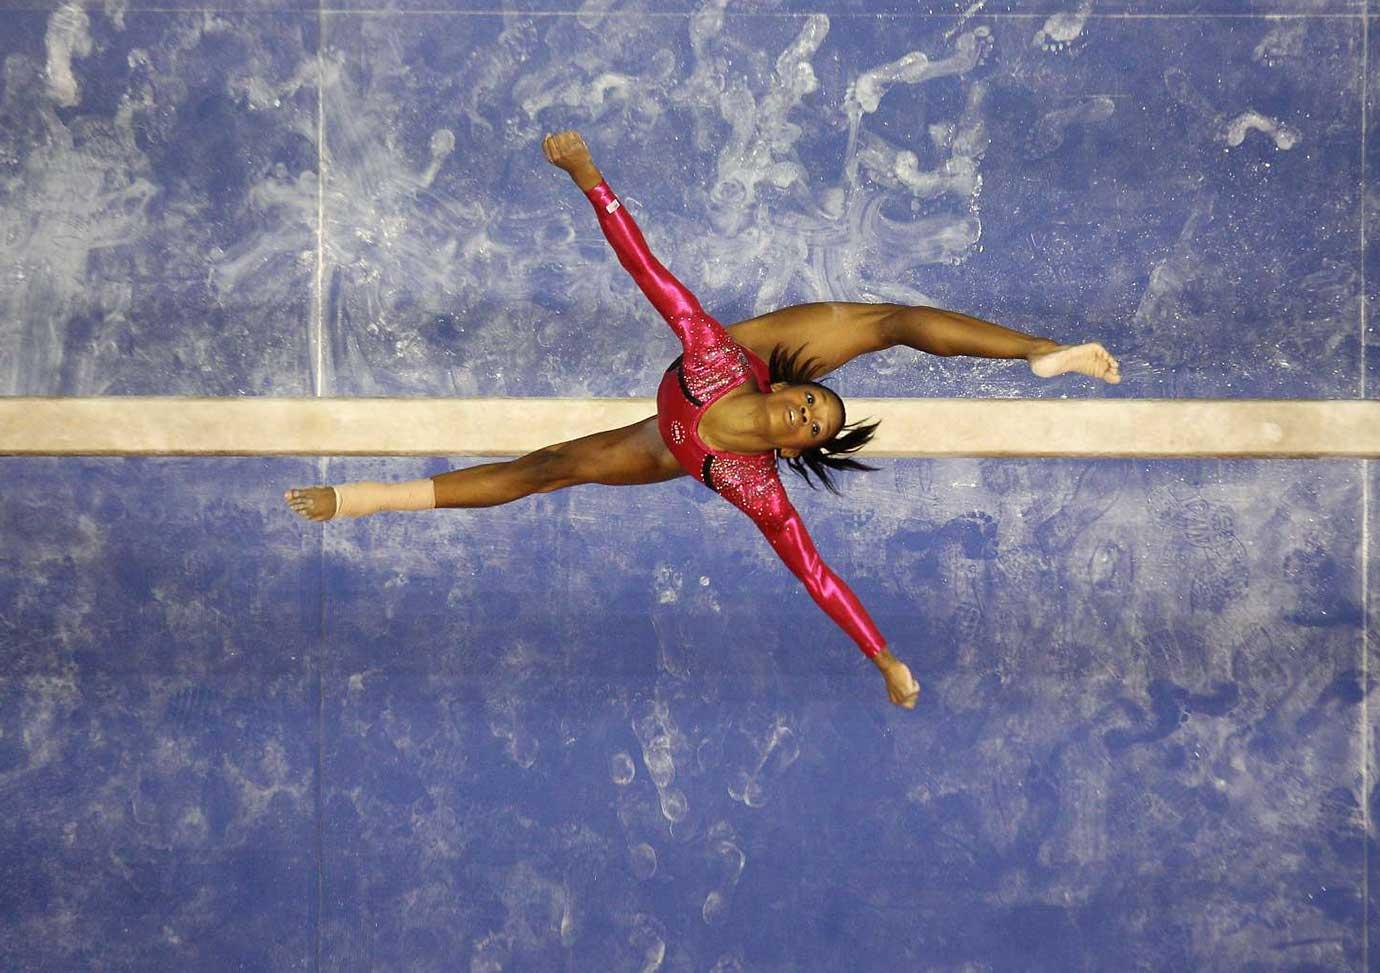 Gabby Douglas at the 2012 U.S. Olympic gymnastics trials.